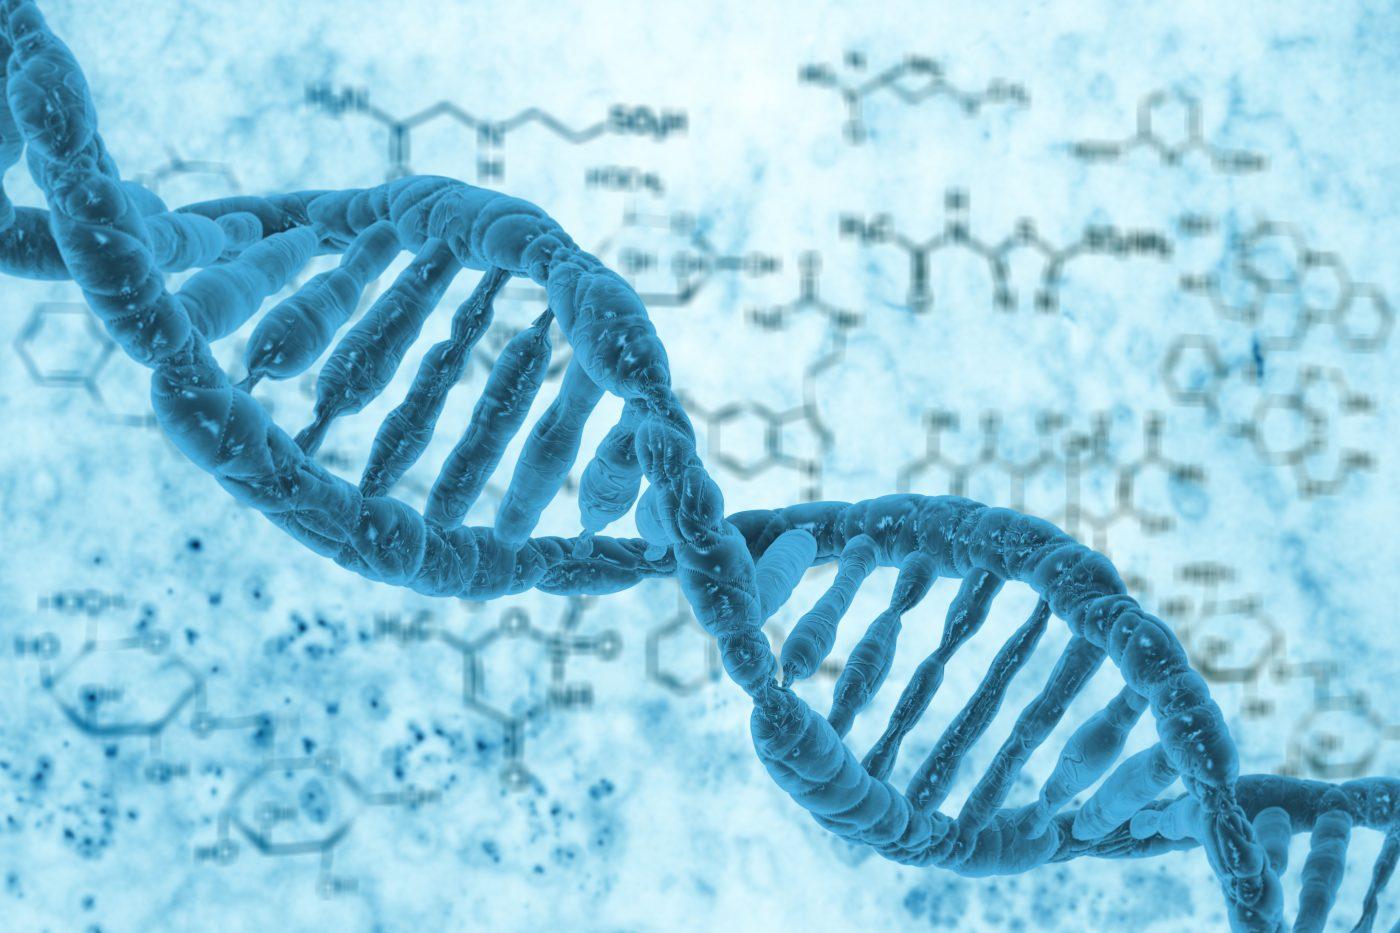 Genetic Link to Metabolism in Diabetes is Complicated